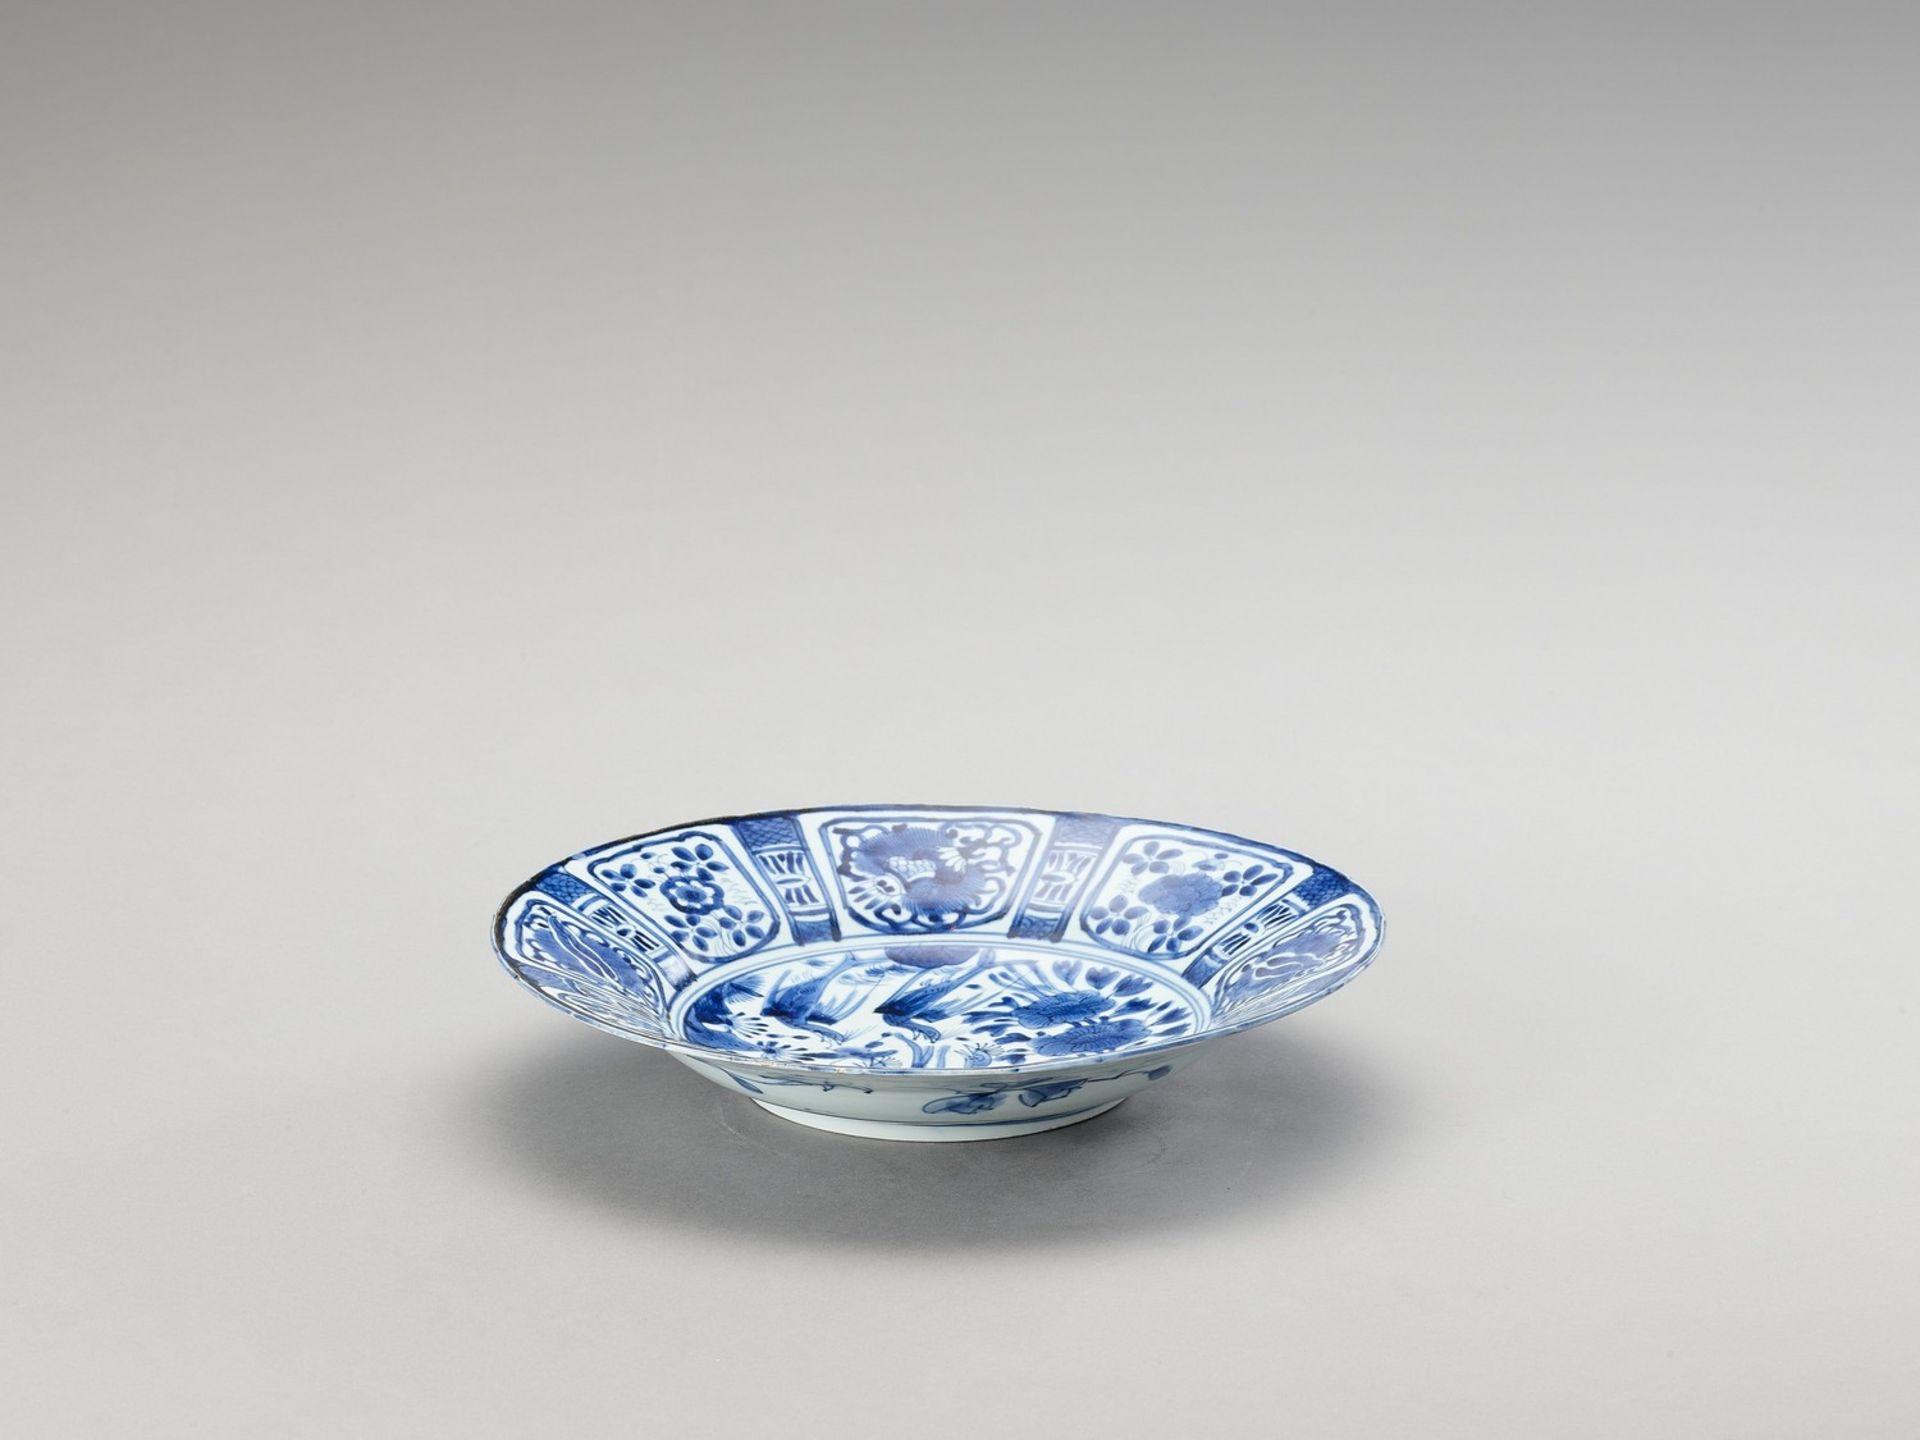 A BLUE AND WHITE PORCELAIN DISH - Bild 2 aus 4